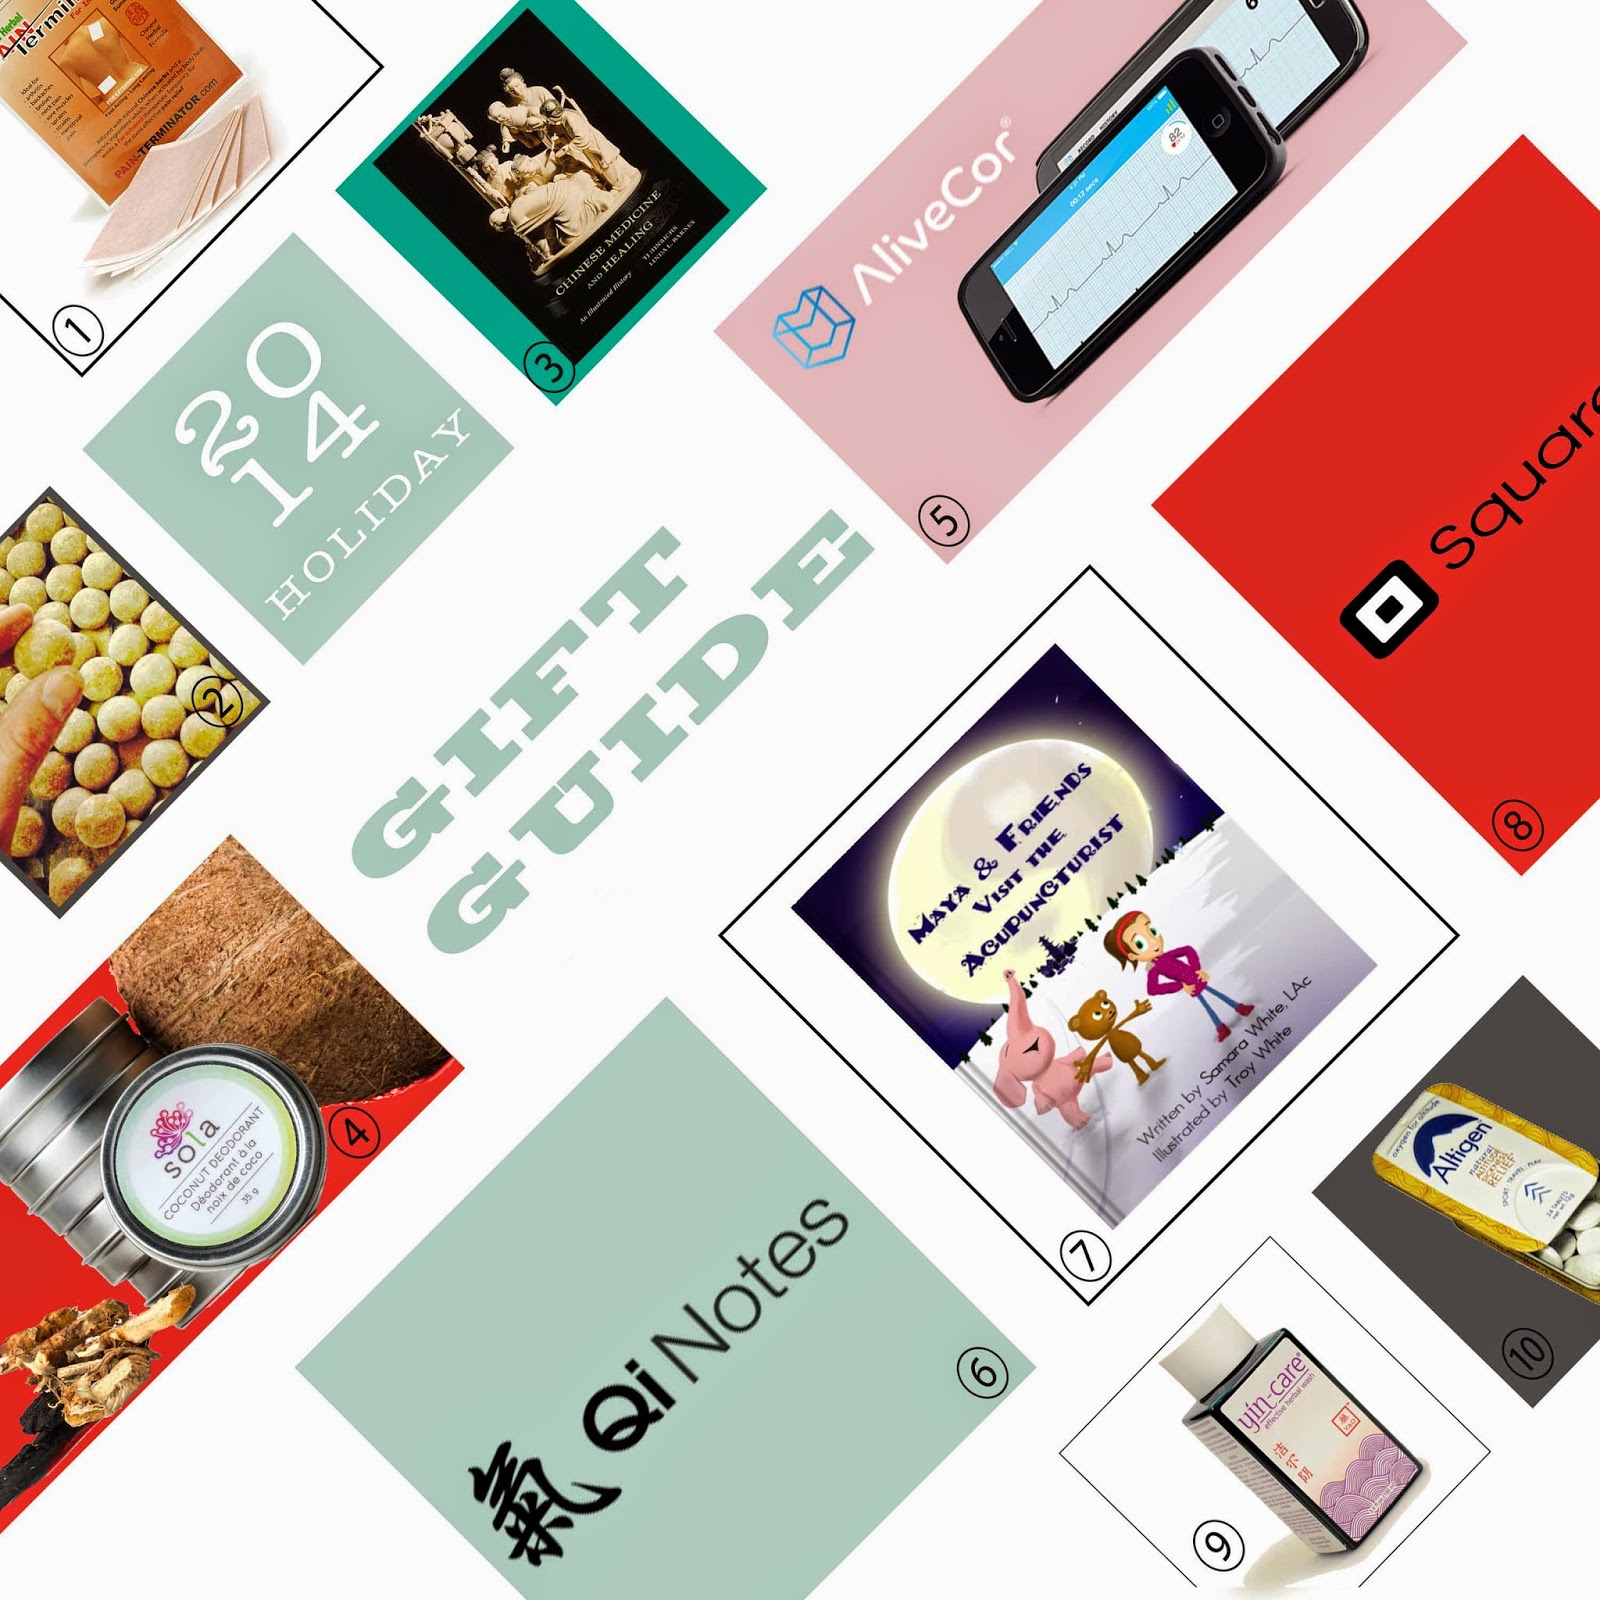 Yin Yang Holiday Gift Guide Featuring Maya & Friends